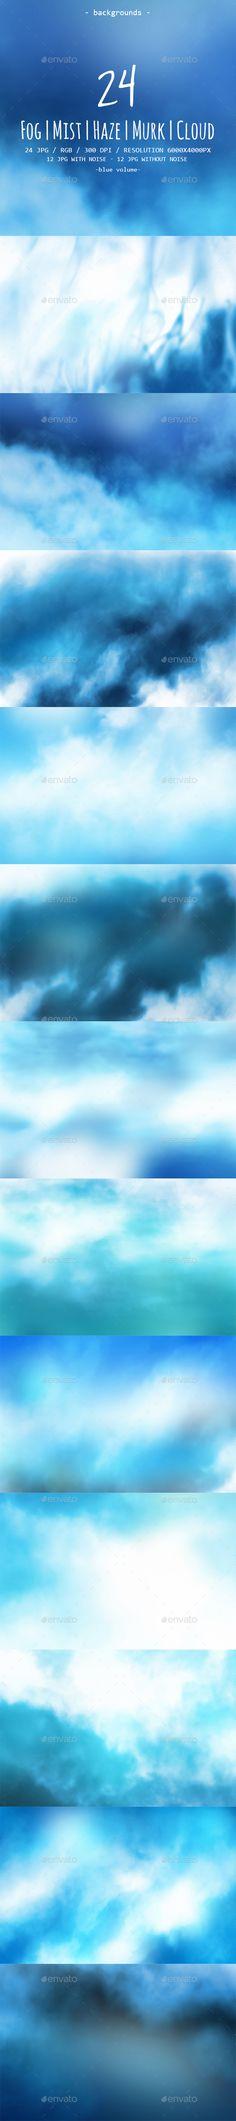 24 Fog   Mist   Haze   Murk   Cloud Backgrounds. Download here: http://graphicriver.net/item/24-fog-mist-haze-murk-cloud-backgrounds/14447177?ref=ksioks